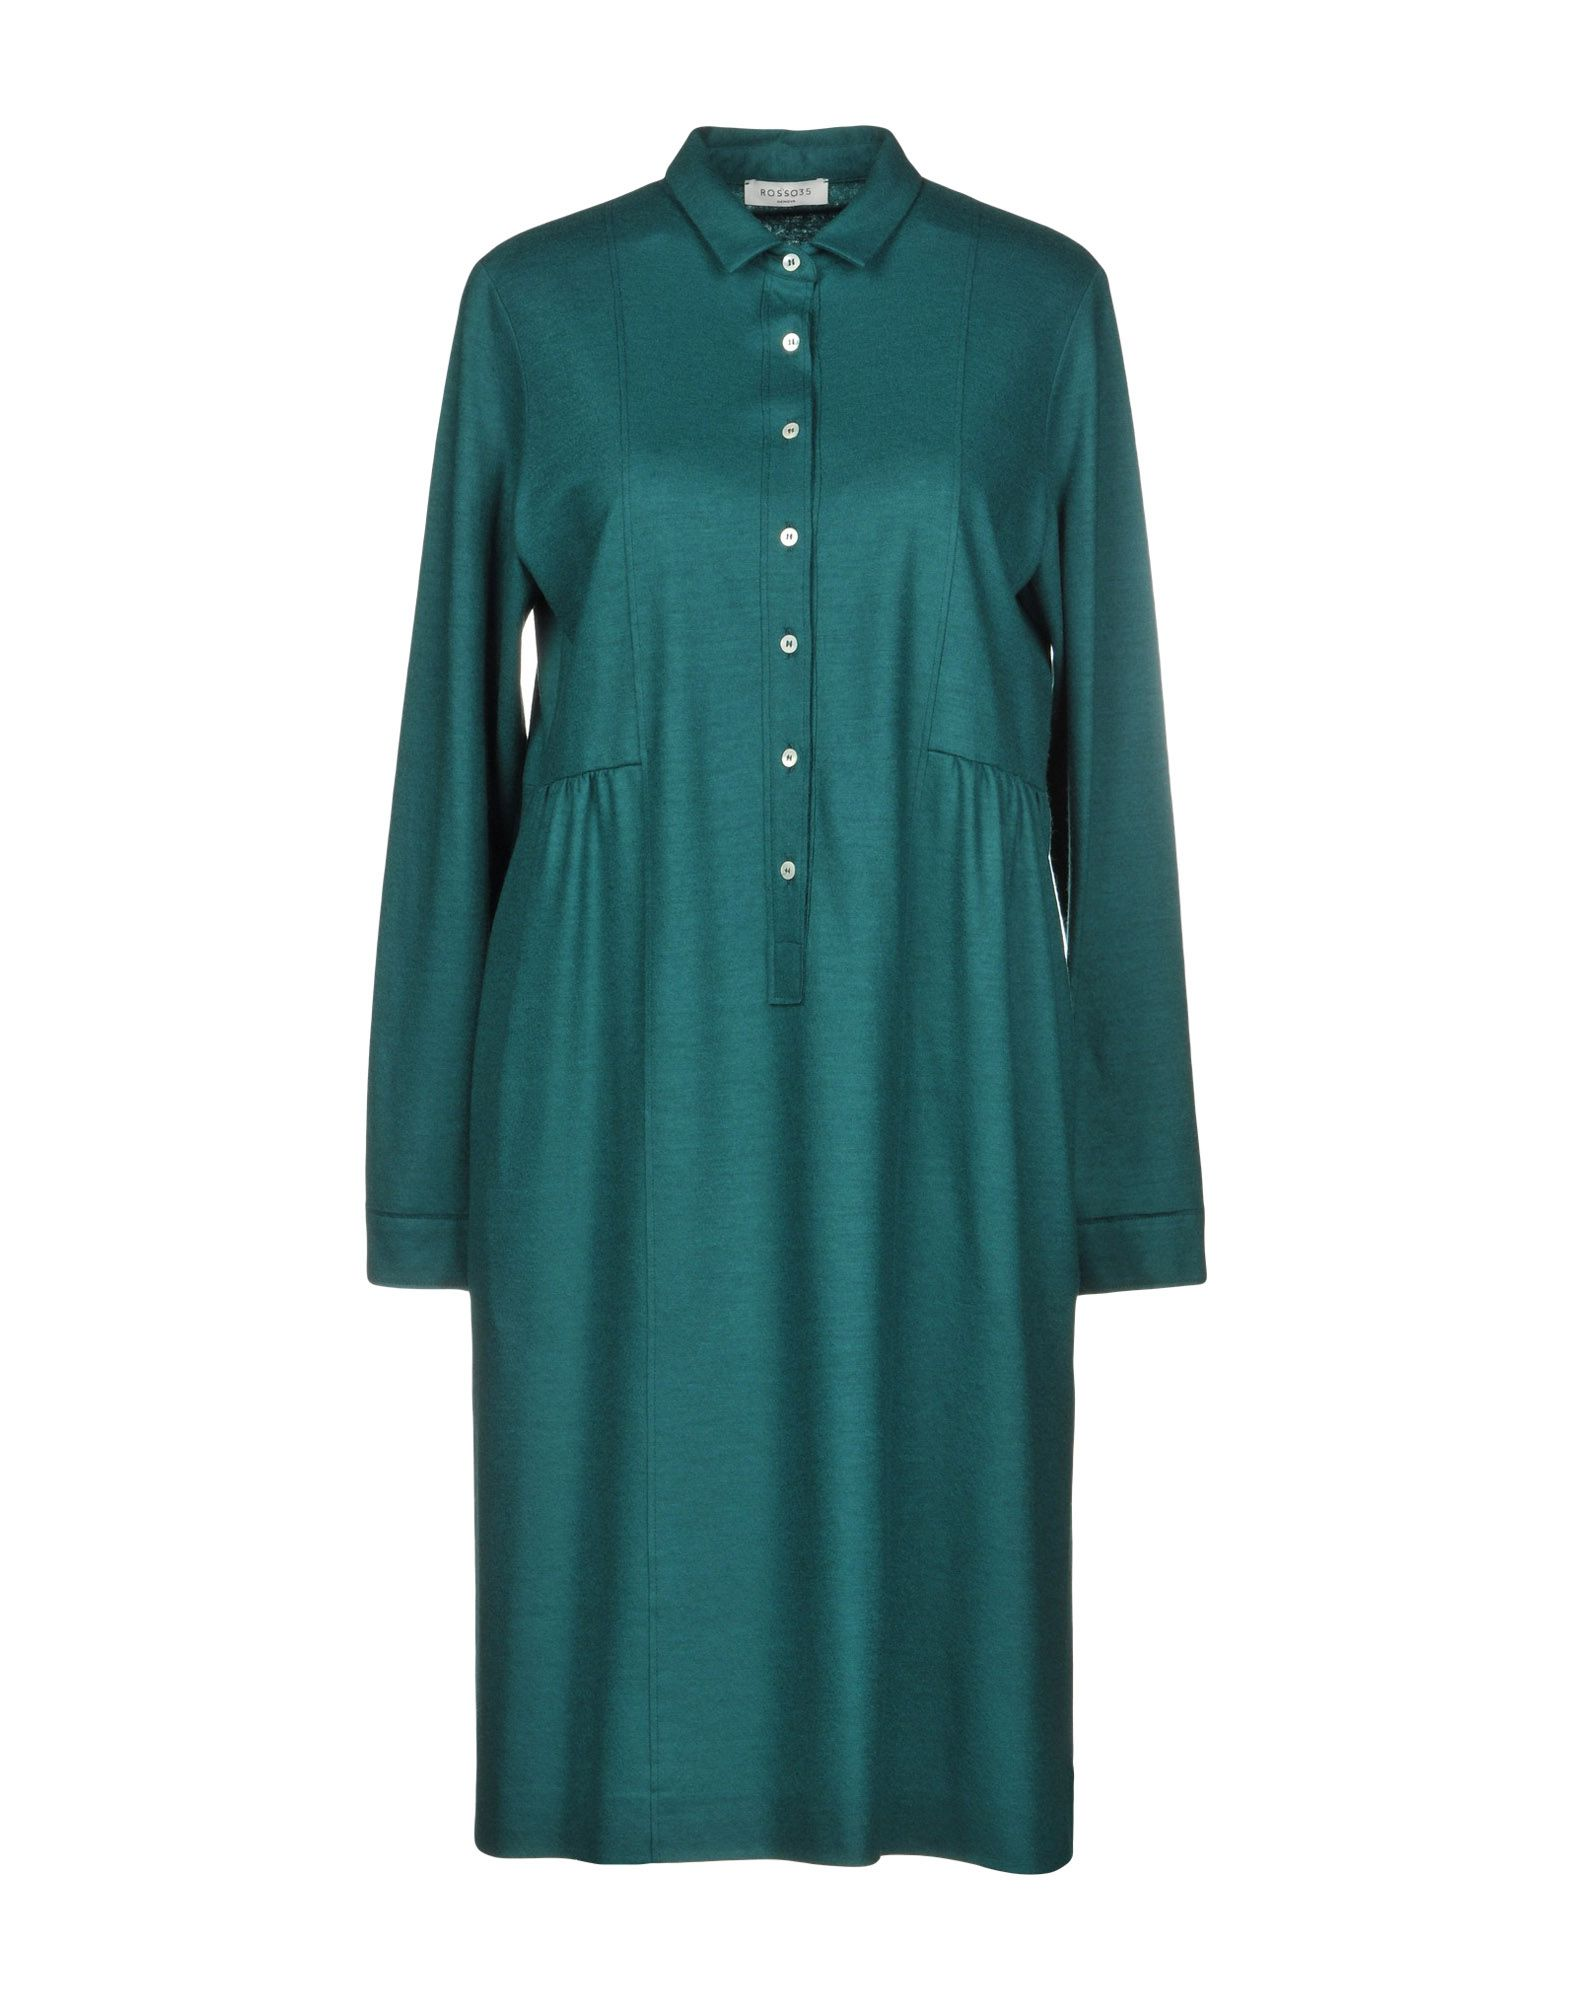 ROSSO35 Короткое платье платье рубашка fox yulia sway платье рубашка fox